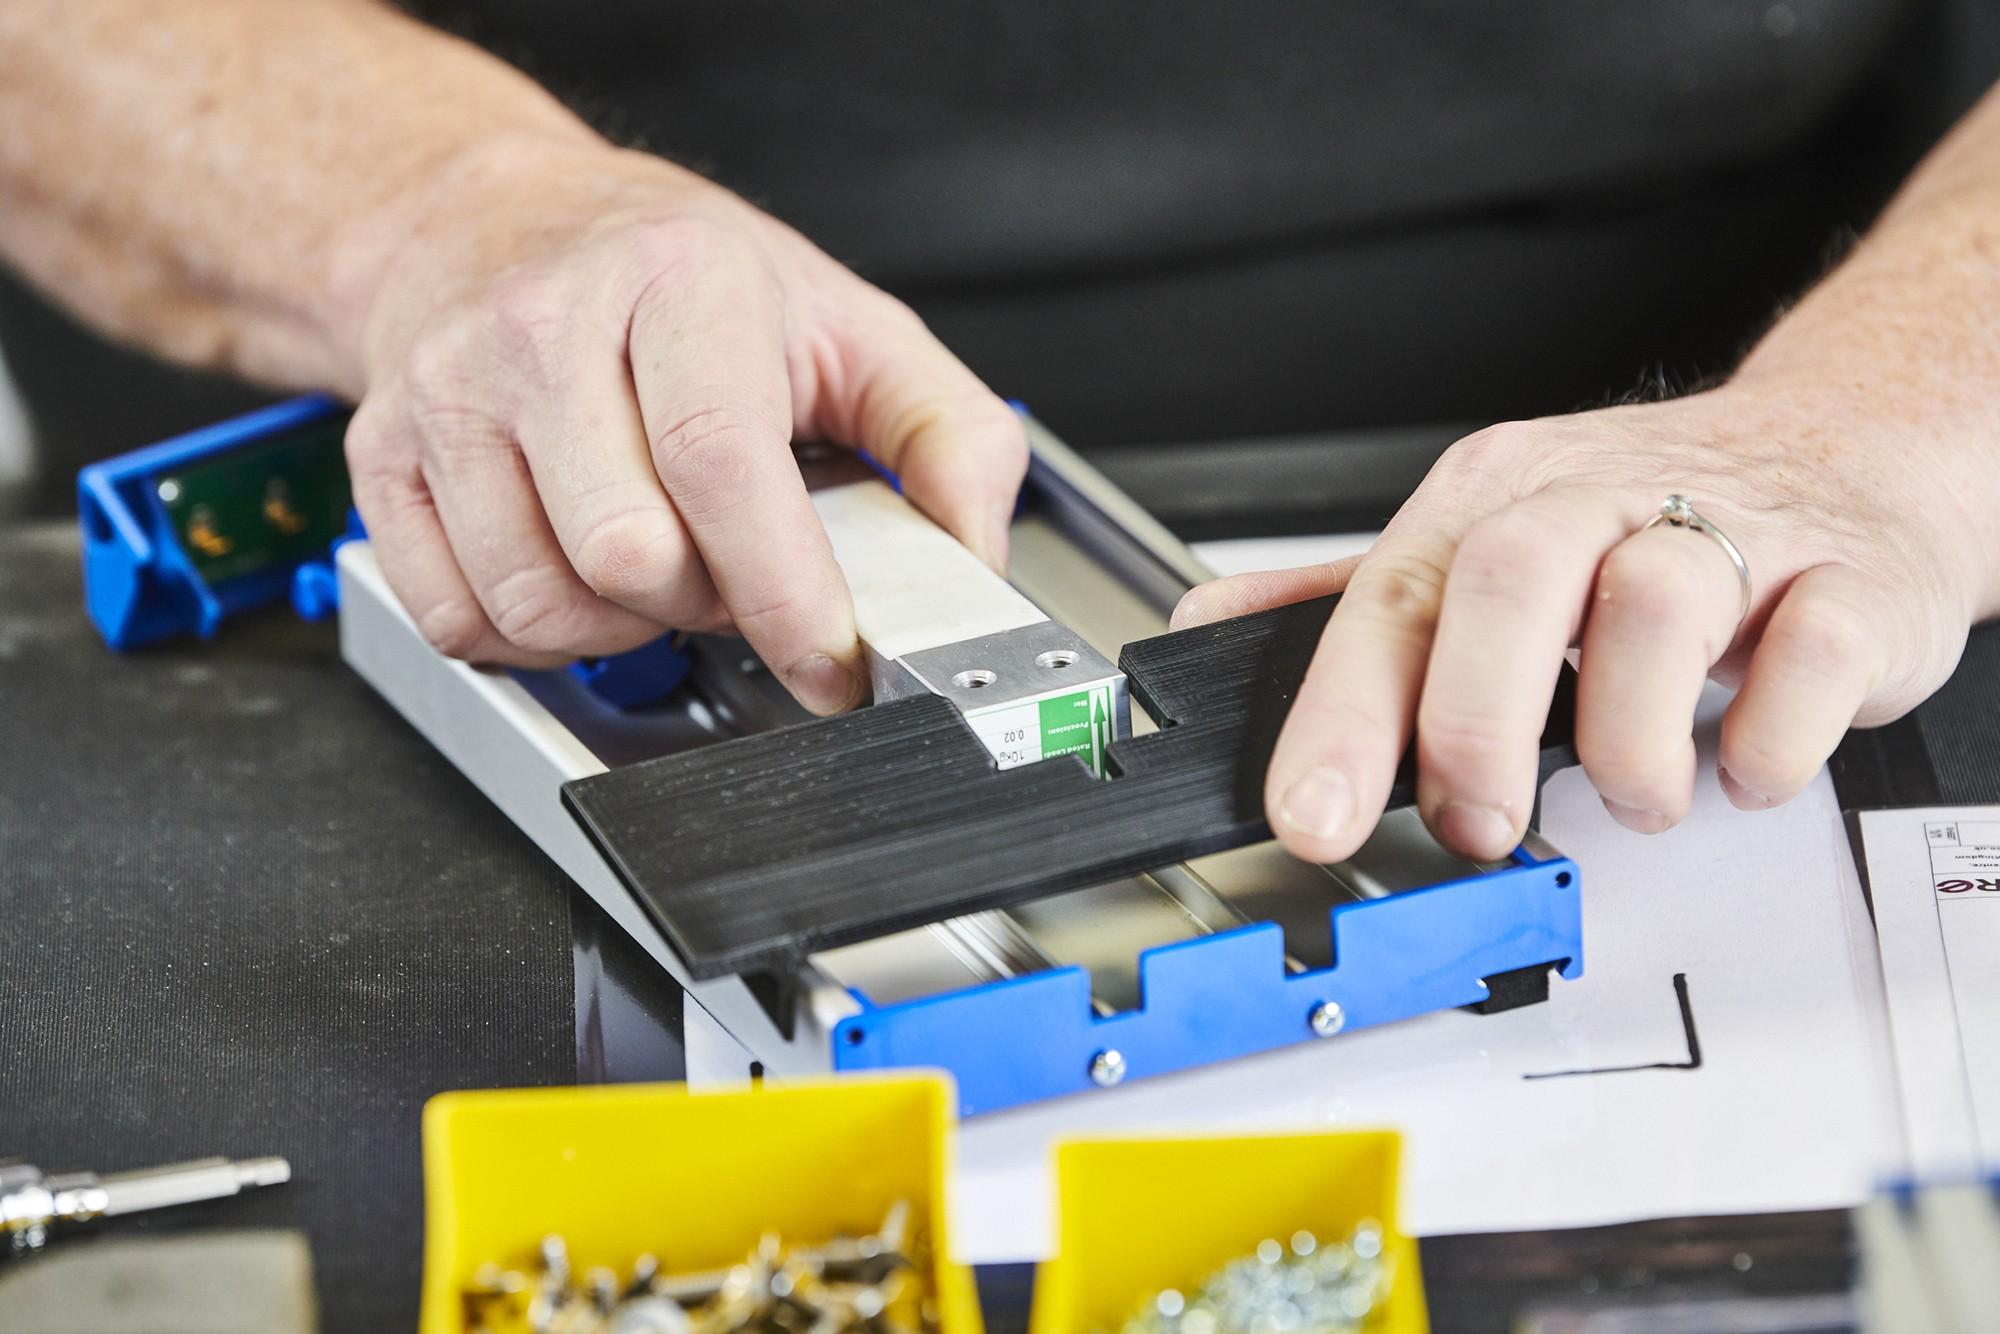 Inventor-e (iVendScale/iBinScale) » PPAutomation Tony Profiles Aug2021 0195 » PP Control & Automation